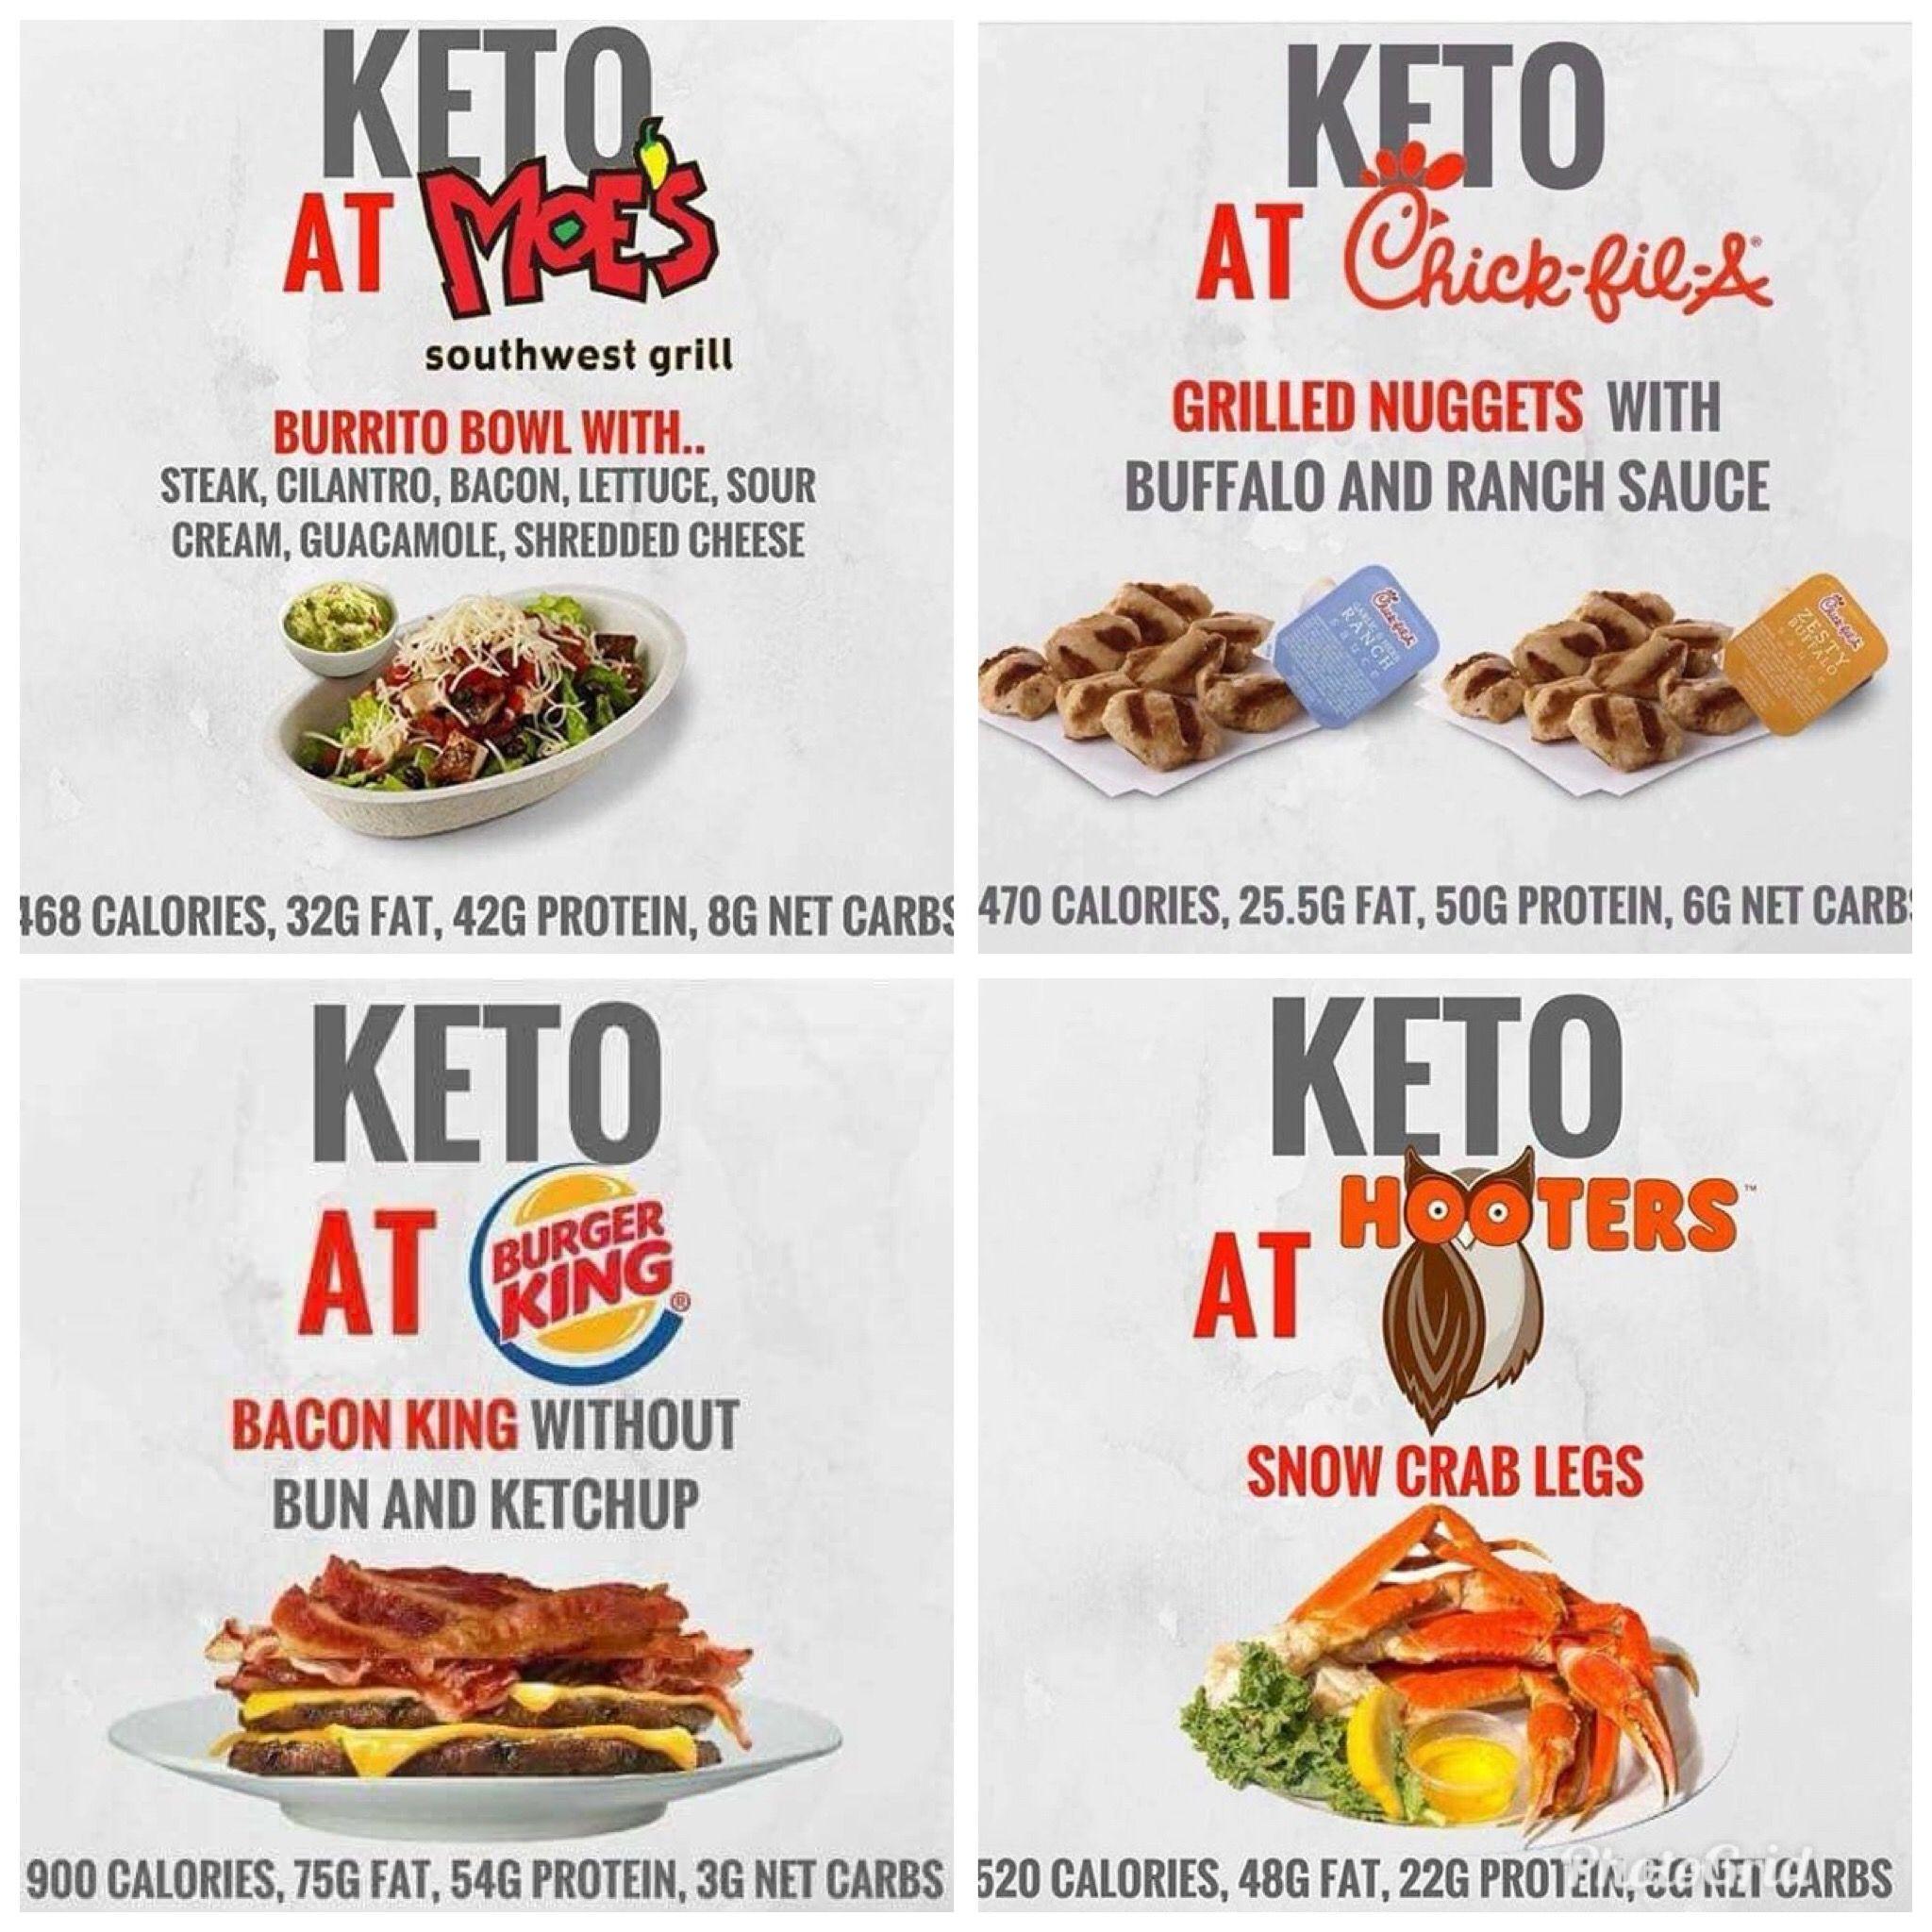 Pin By Lacie Garza On Health Items Keto Fast Food Keto Diet Recipes Starting Keto Diet